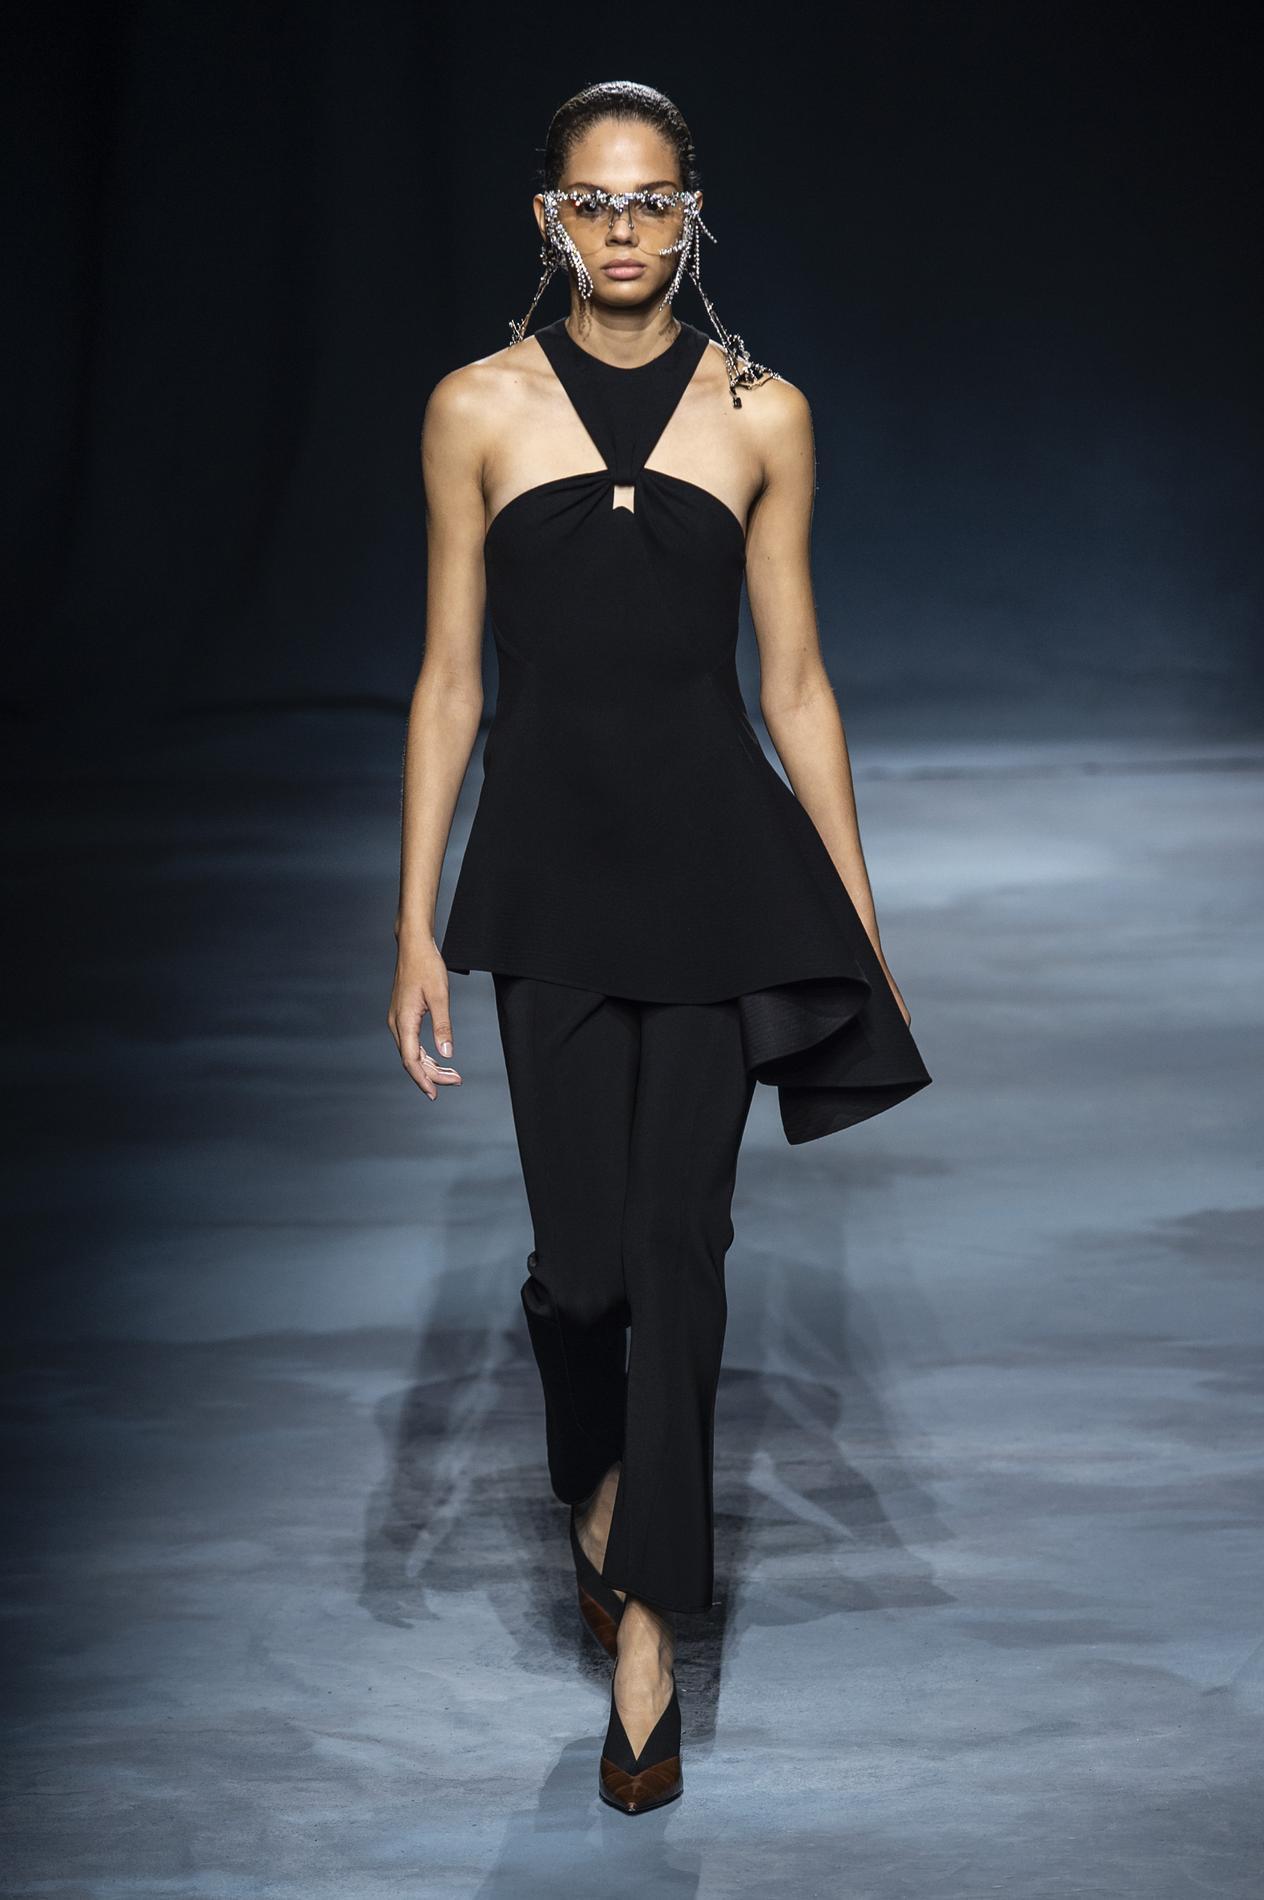 Nouveau Défilé Madame Figaro GivenchyLe Féminin b76Ygyfv